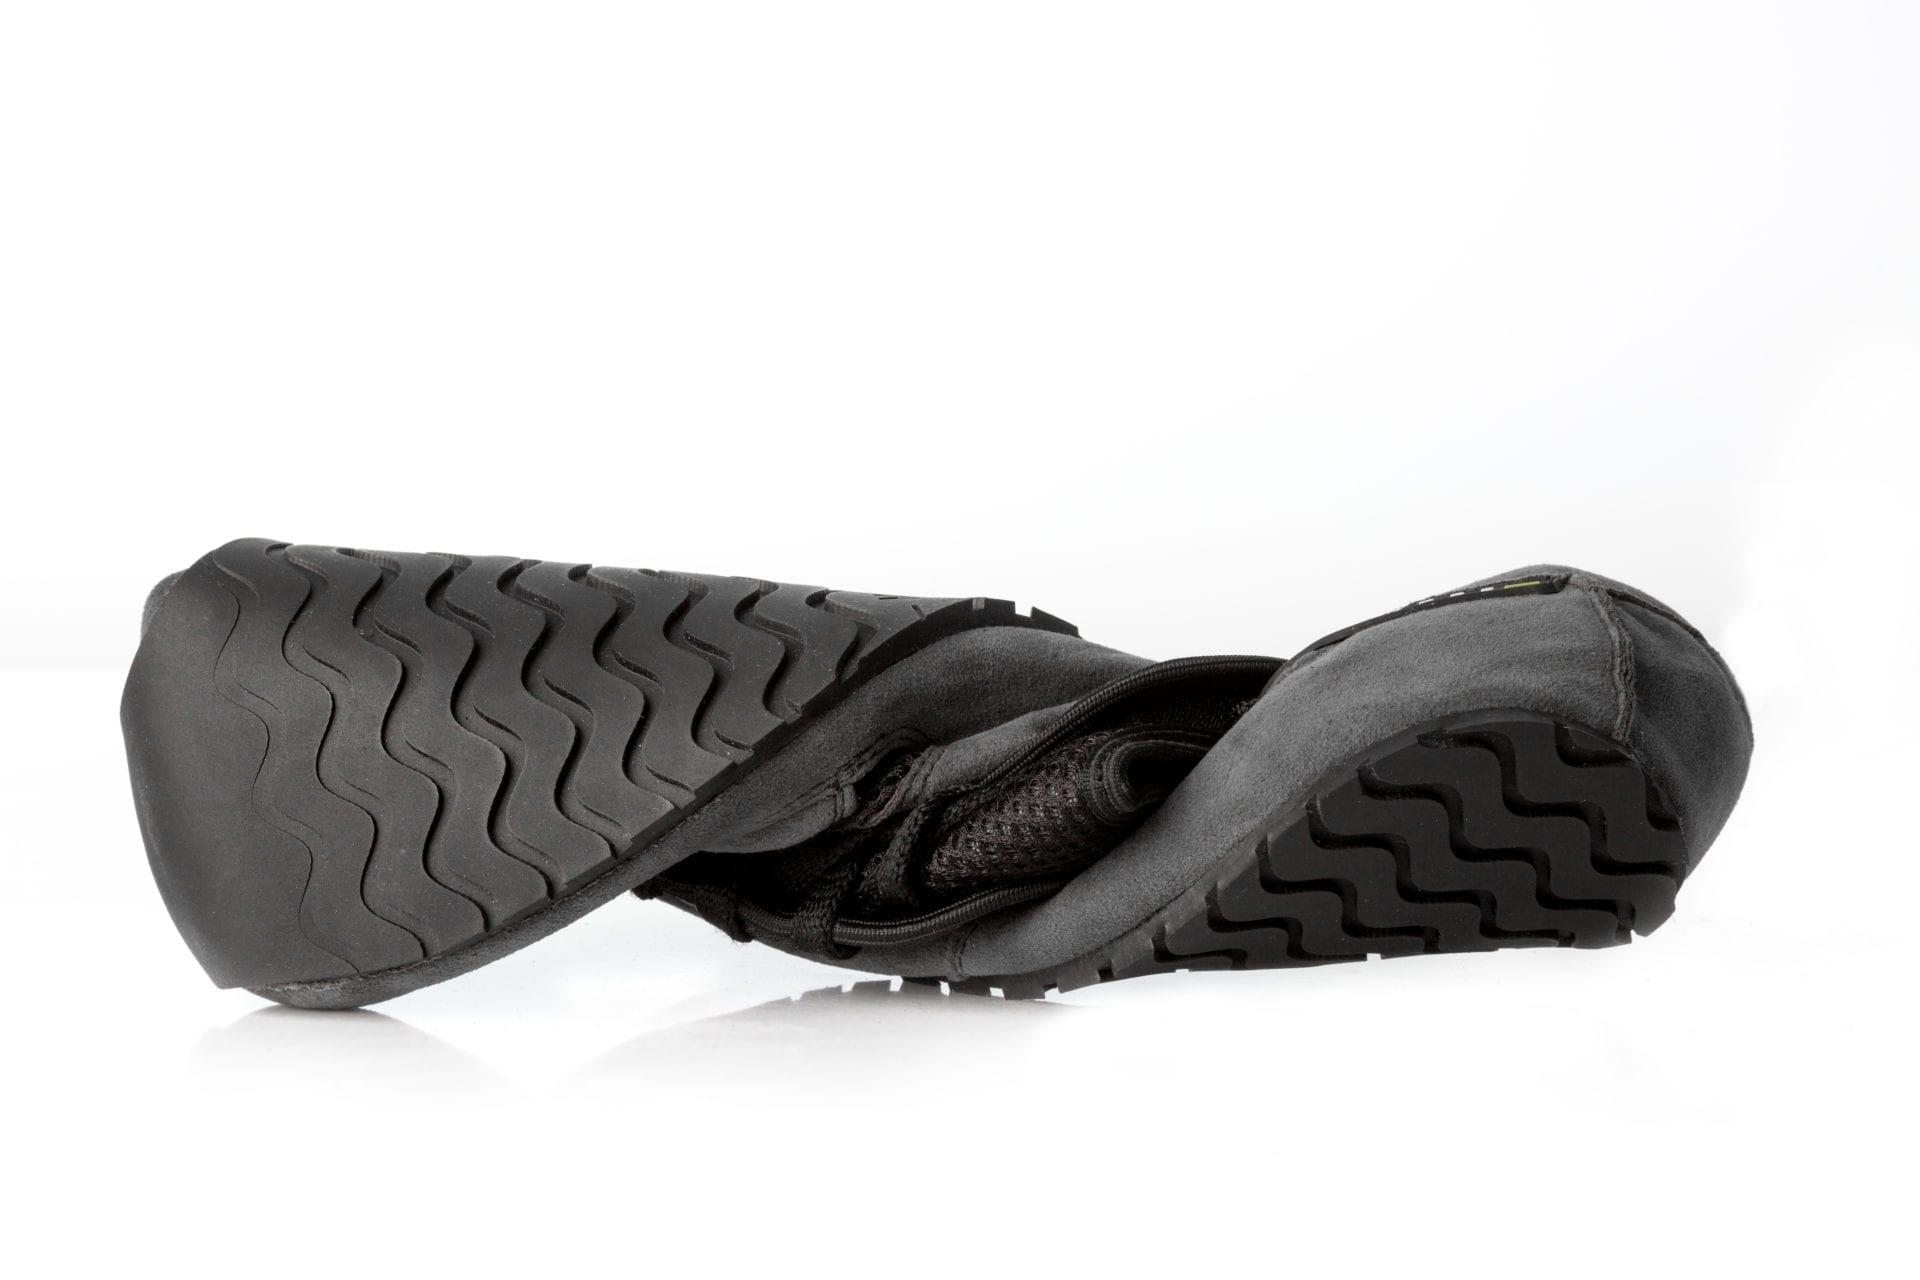 Magical Shoes BAREFOOT SHOES EXPLORER VEGAN GRAY KIDS picture 4